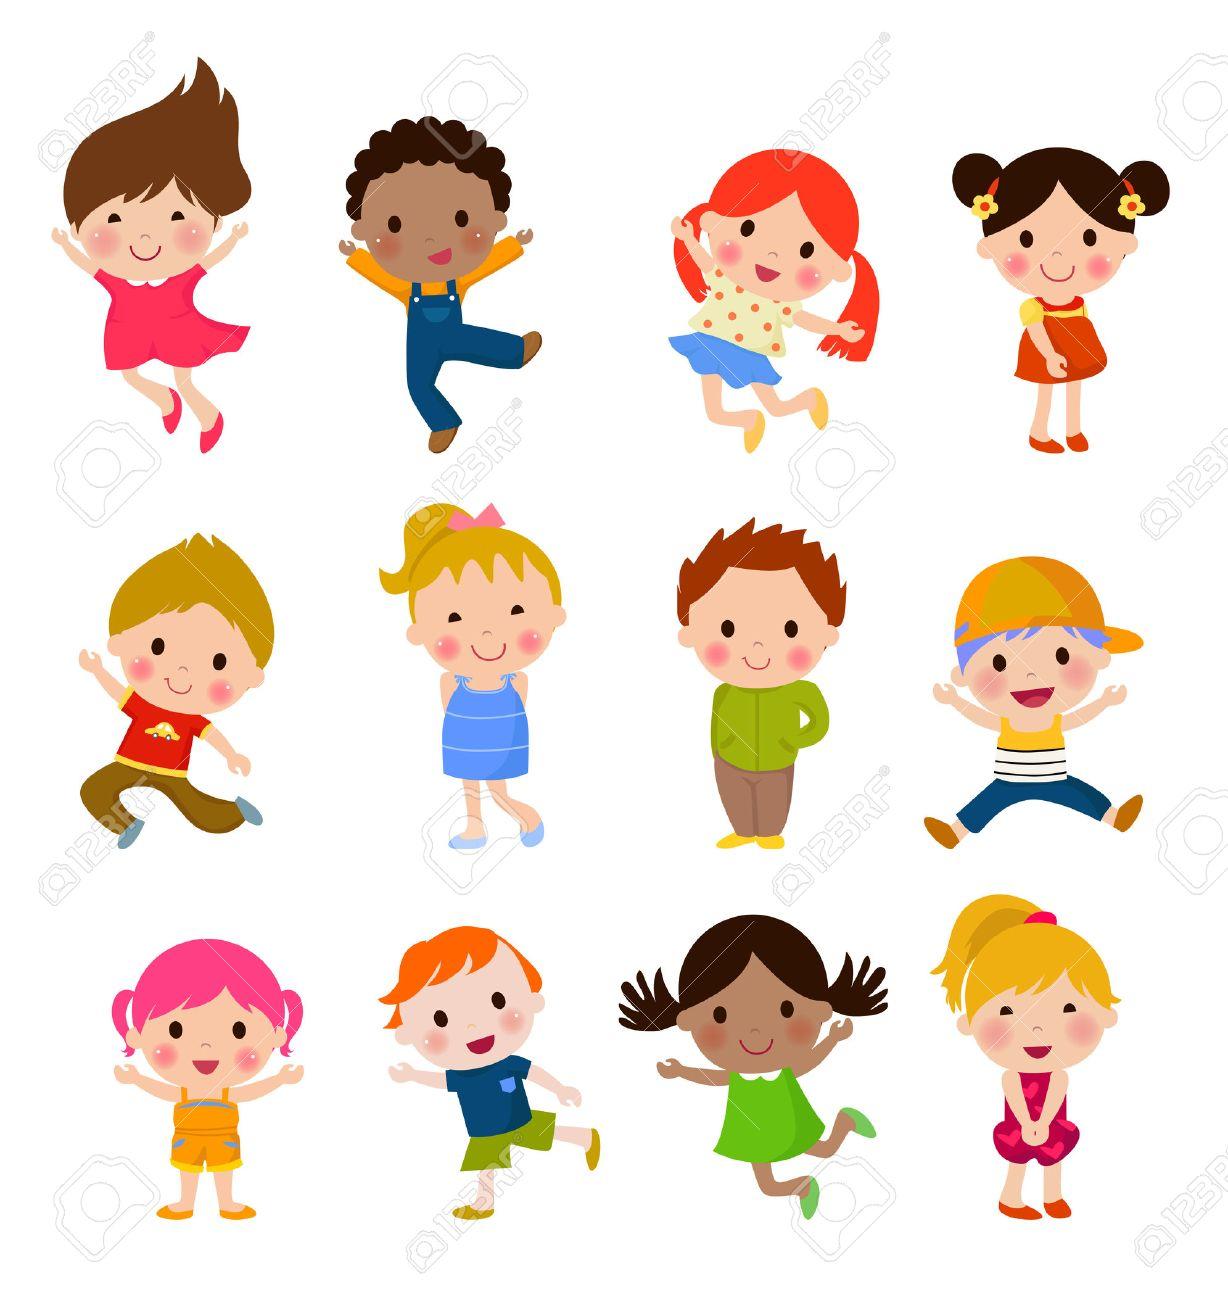 Cute children cartoon collection - 52394053